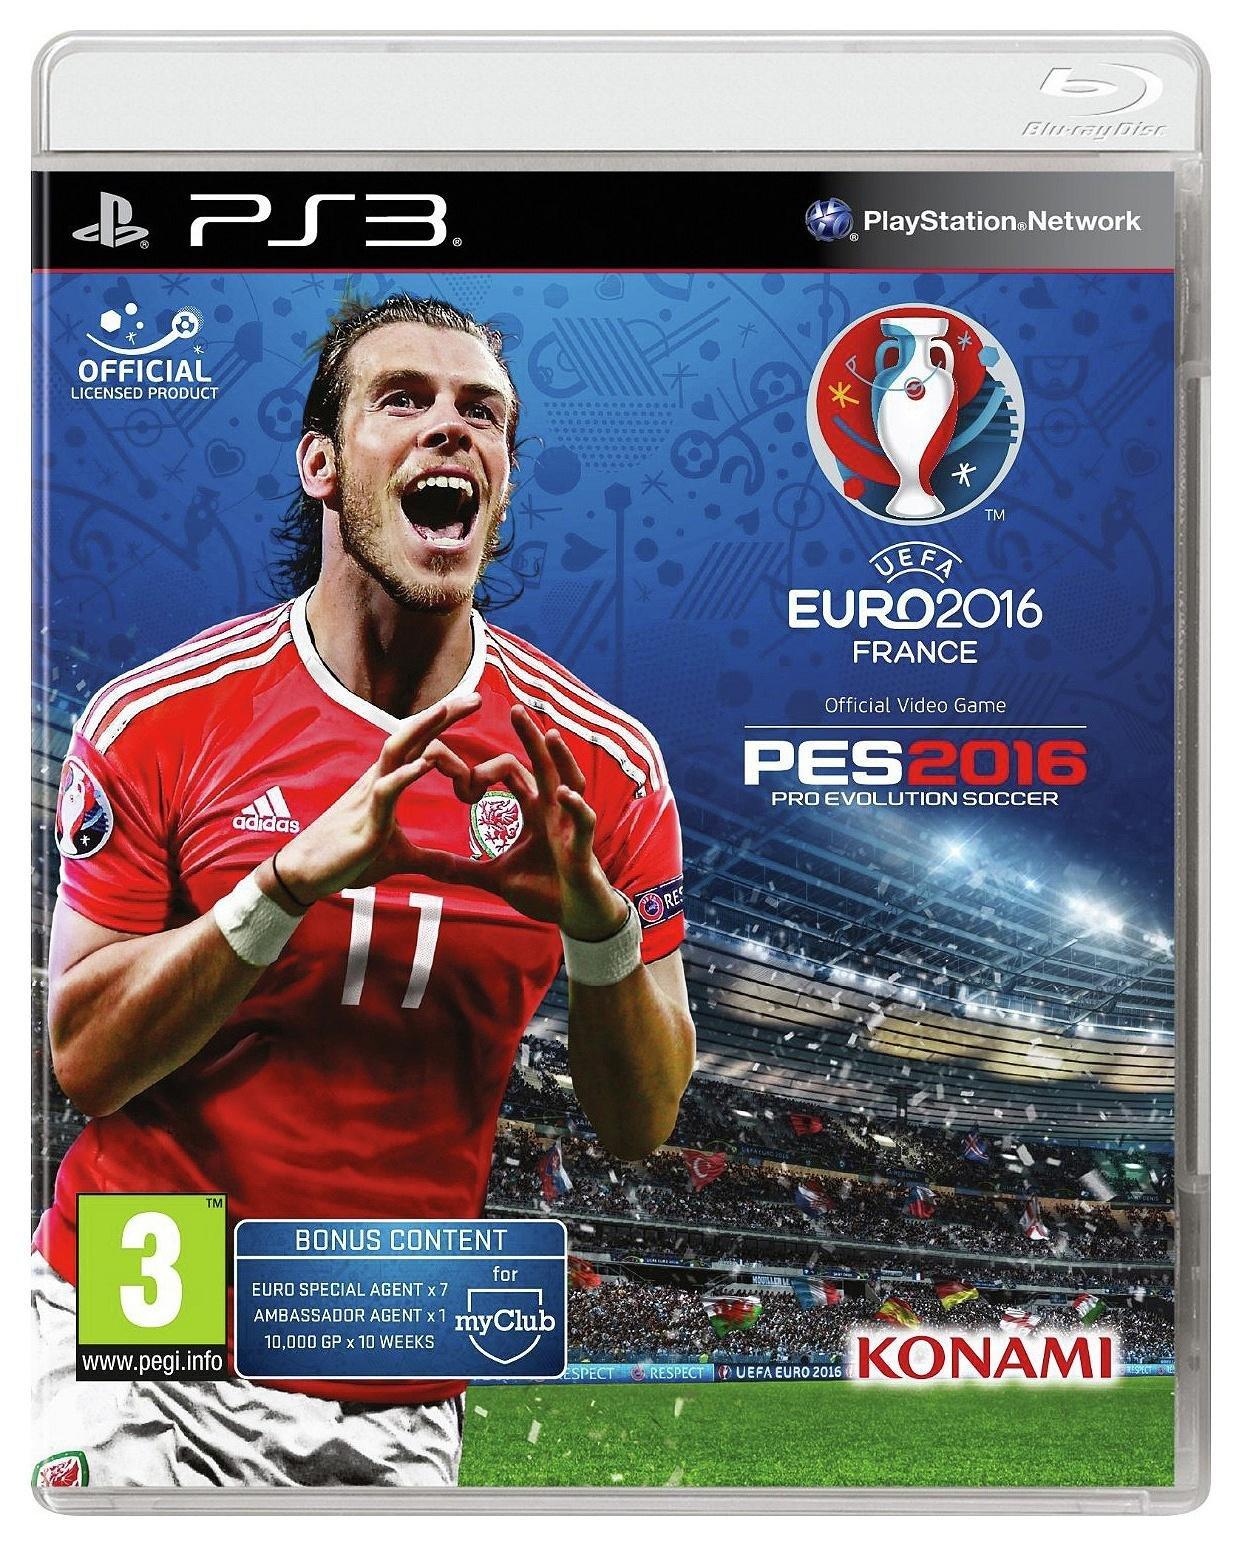 Pes 2016 Pro Evolution Soccer Euro 2016 PS3 Game.